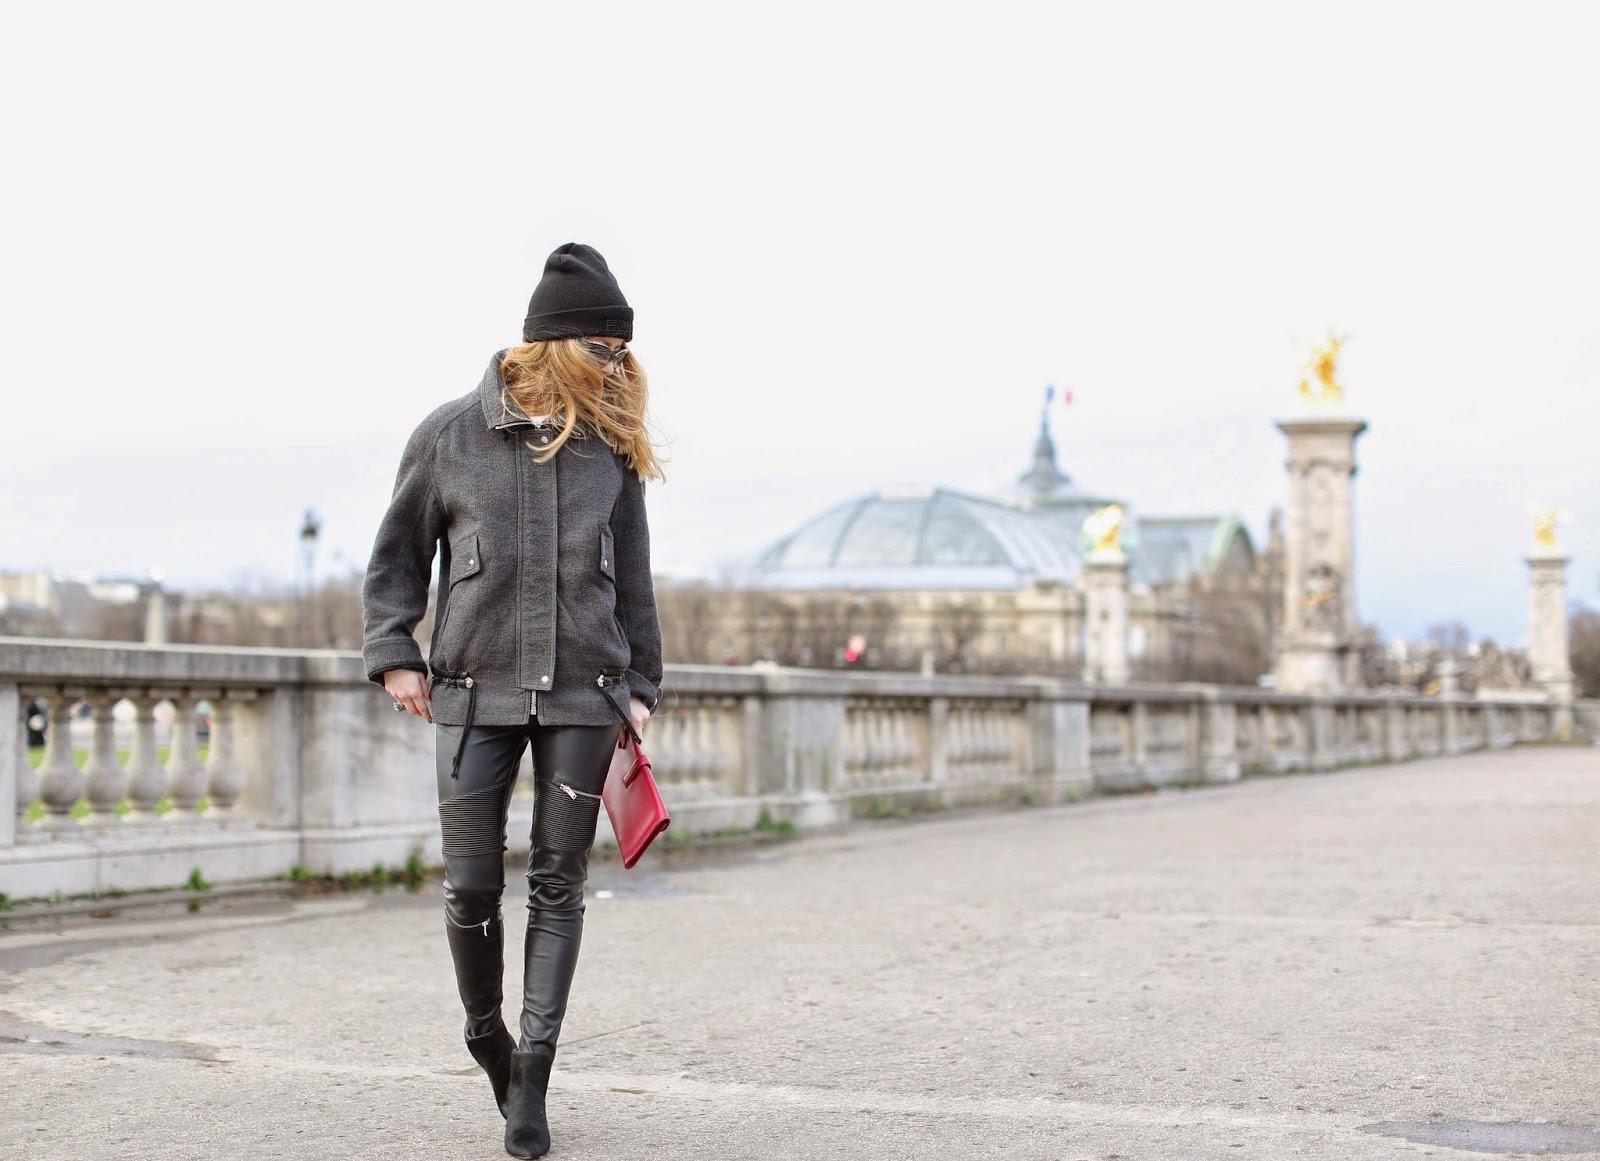 iro, zara, edgy, homies, hermès, paris, streetstyle, fashion blogger, style